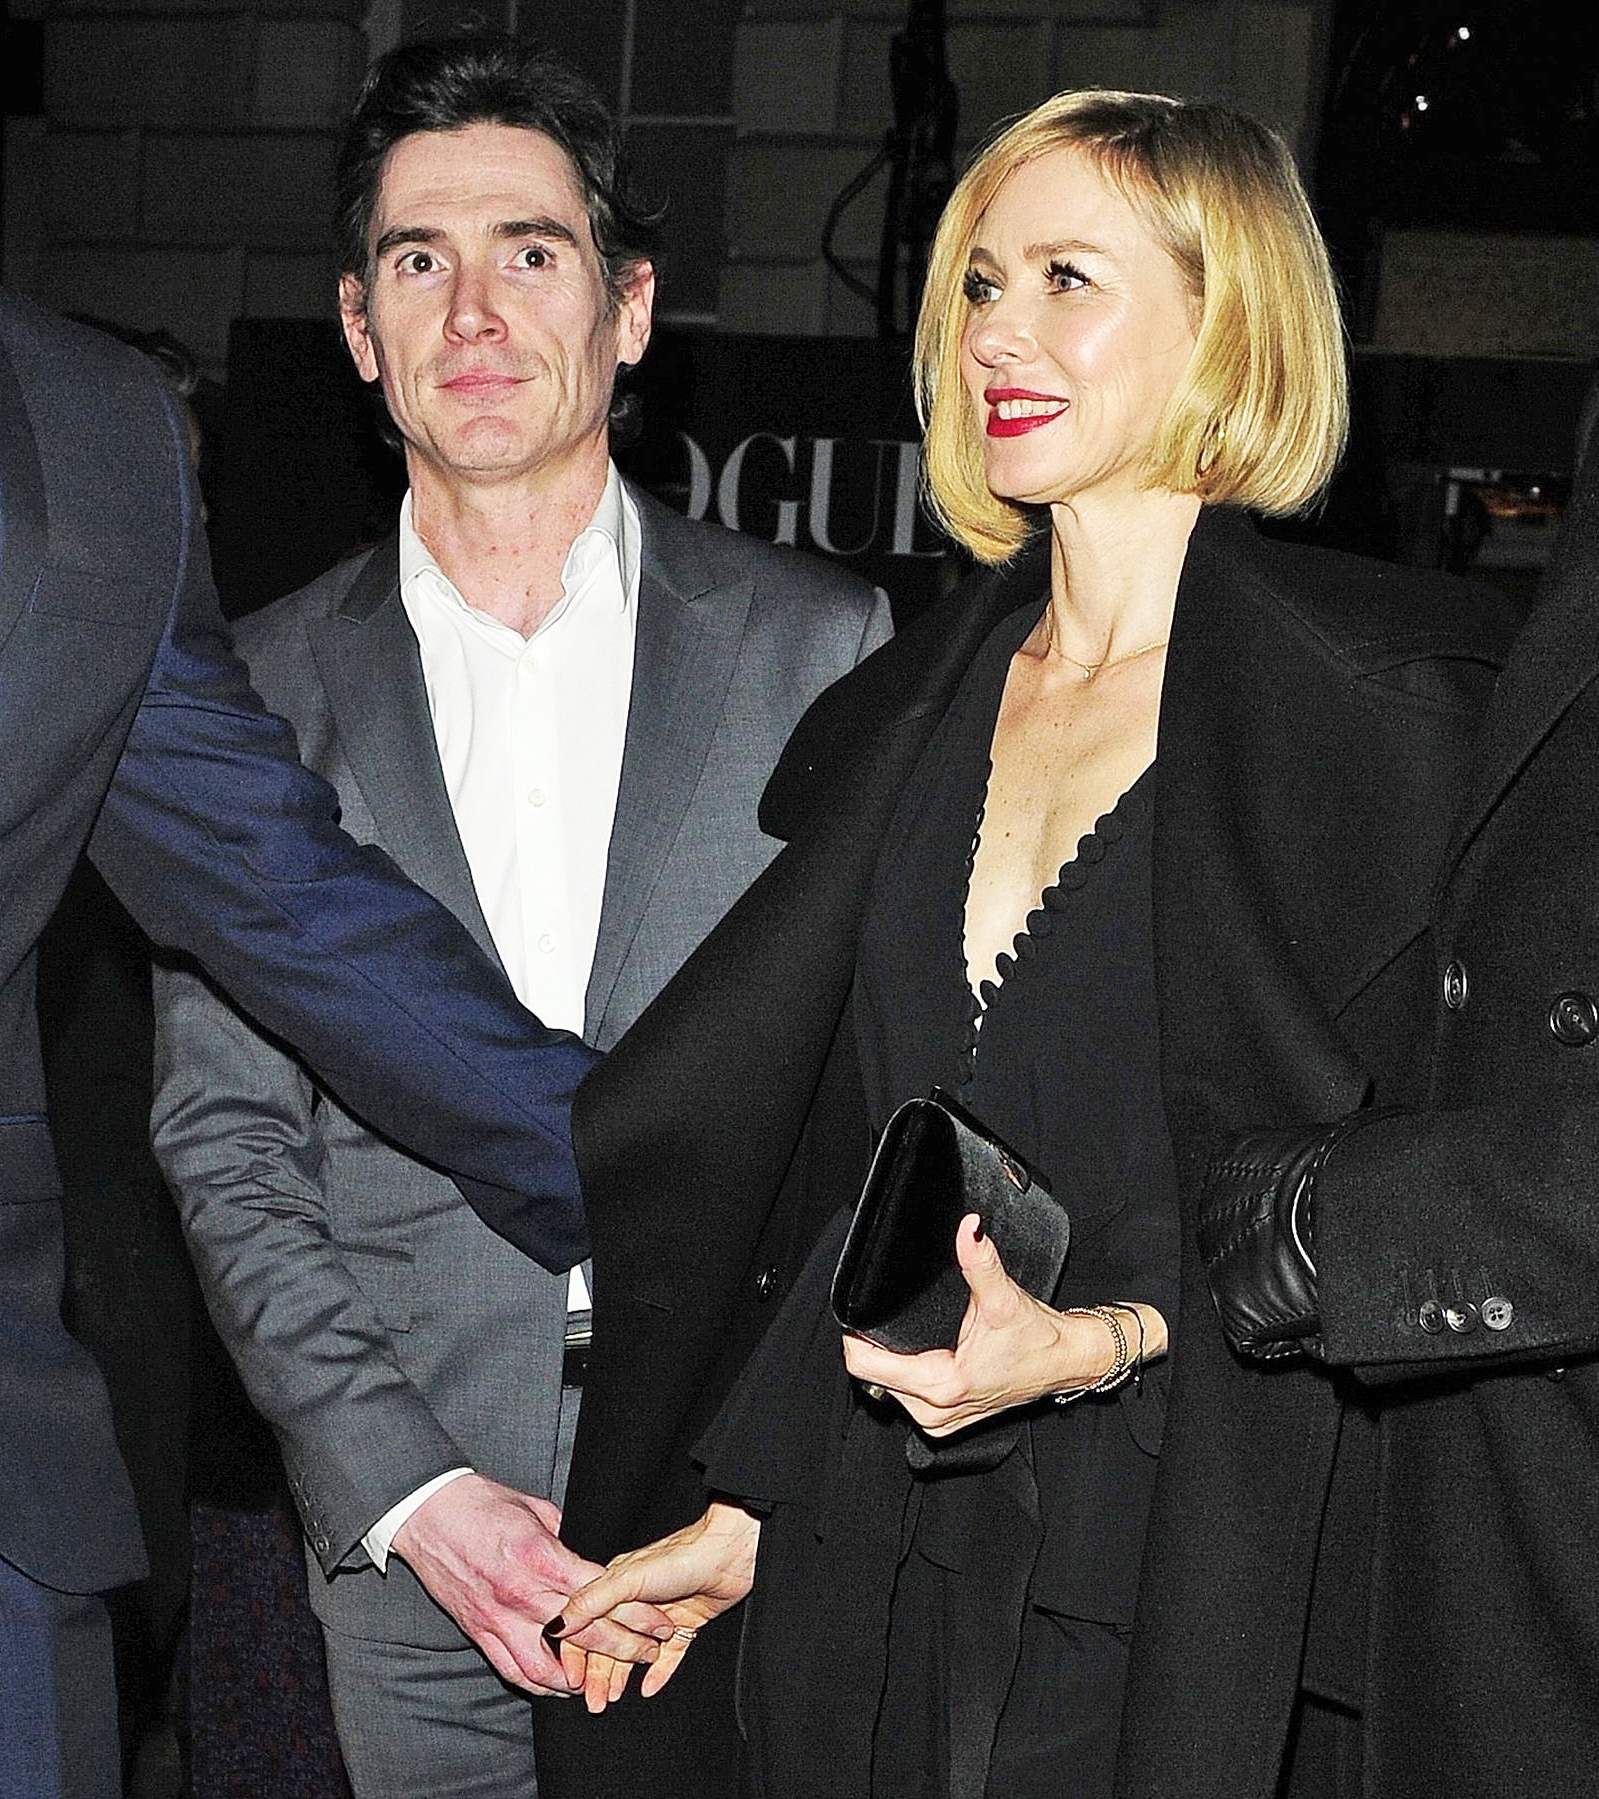 Billy Crudup Naomi Watts holding hands